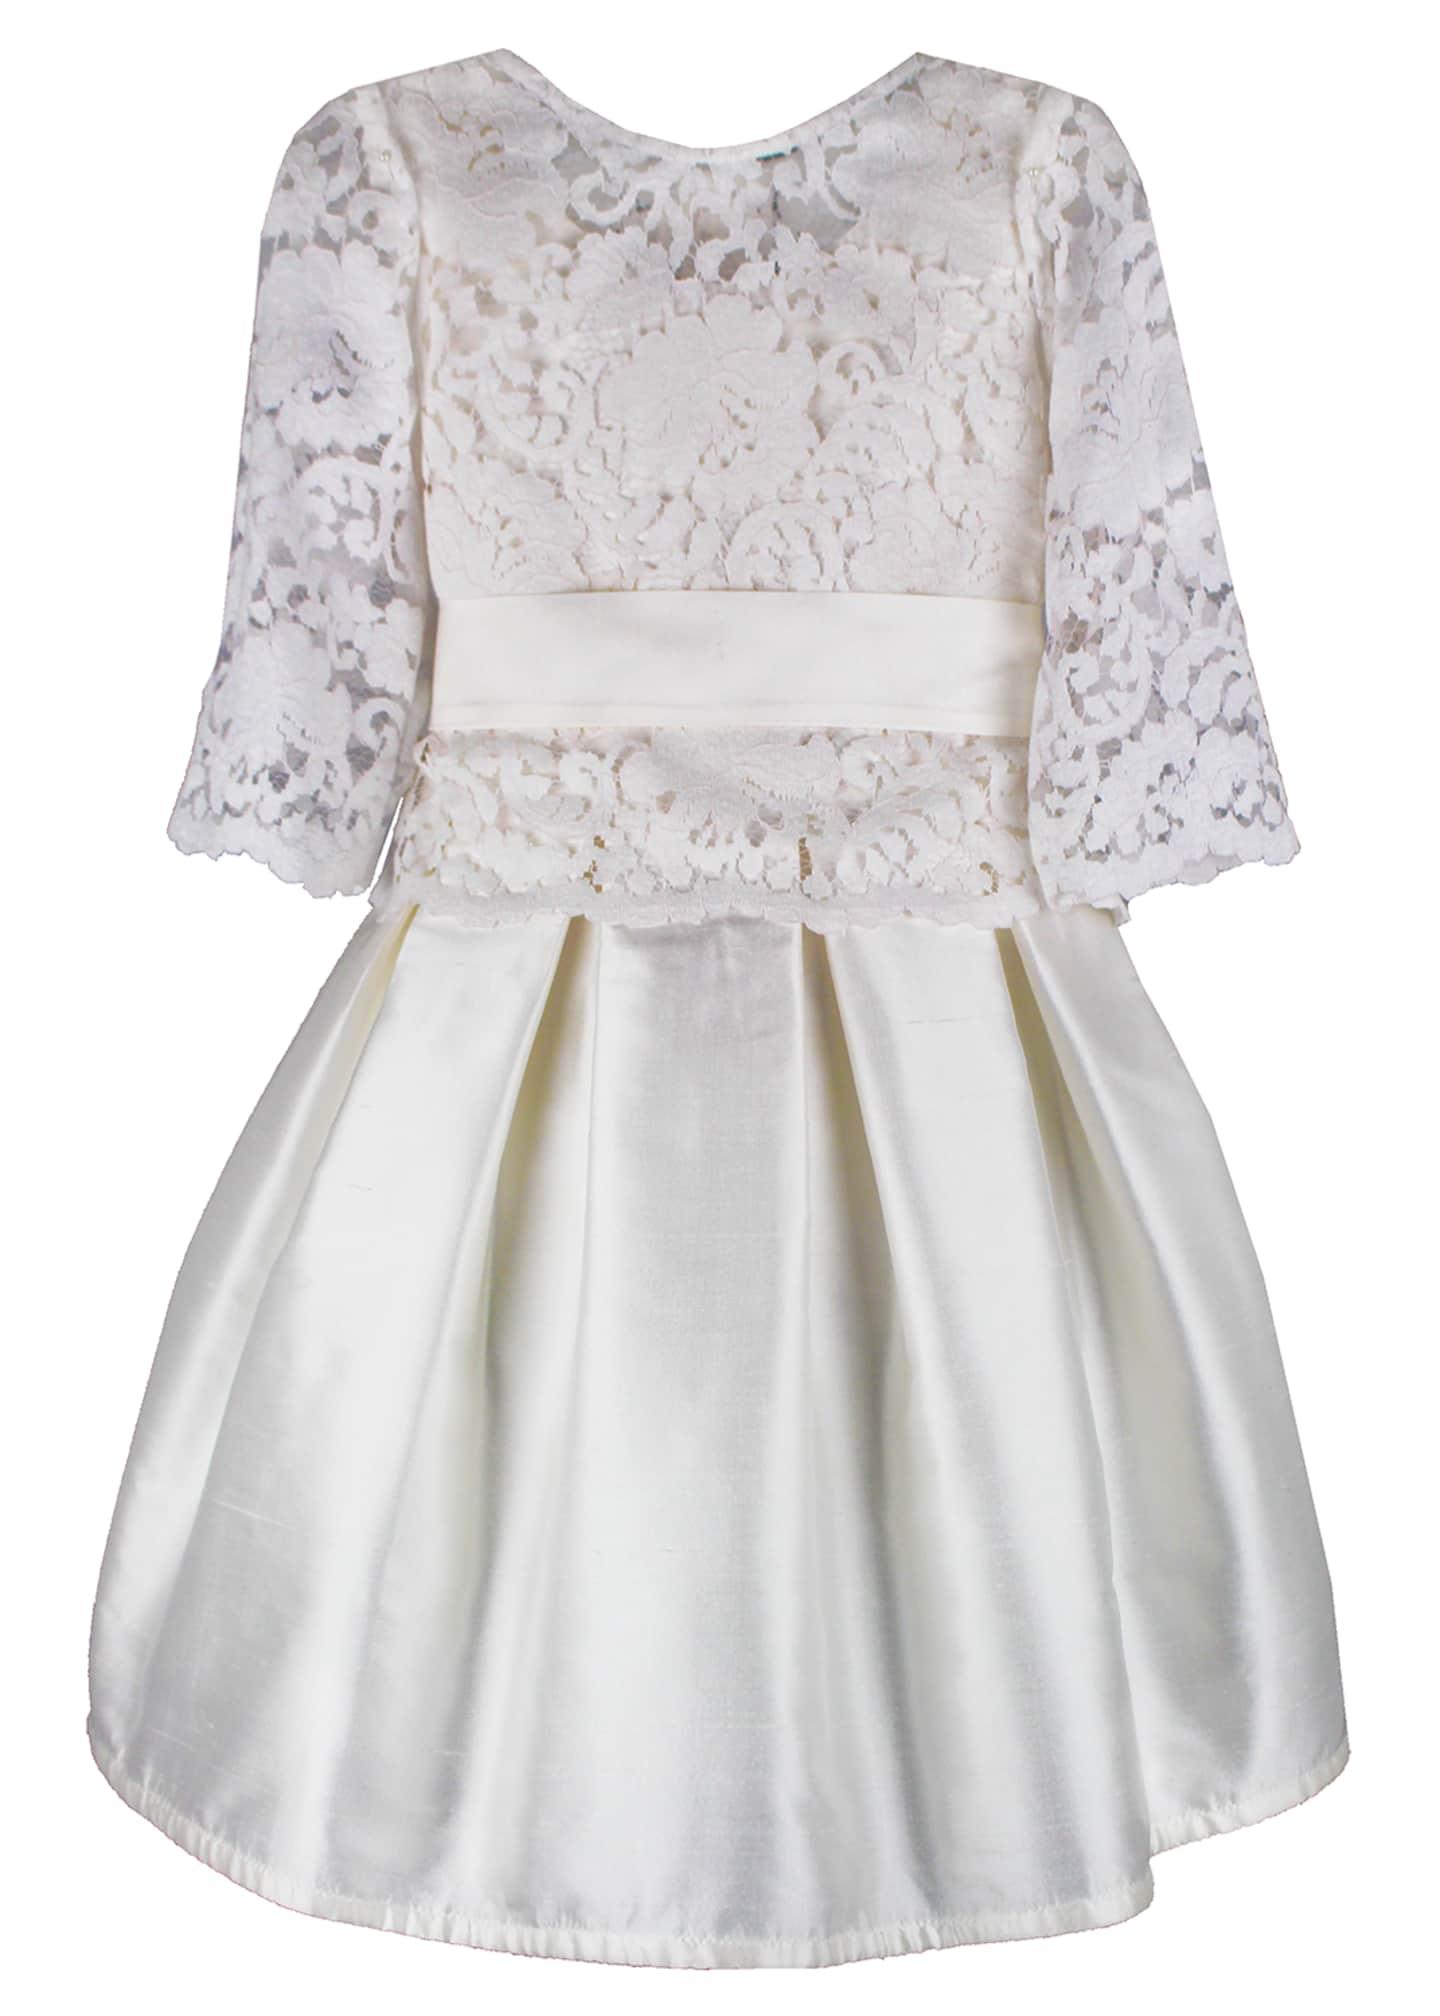 Isabel Garreton Fable Silk Dress w/ Lace Overlay